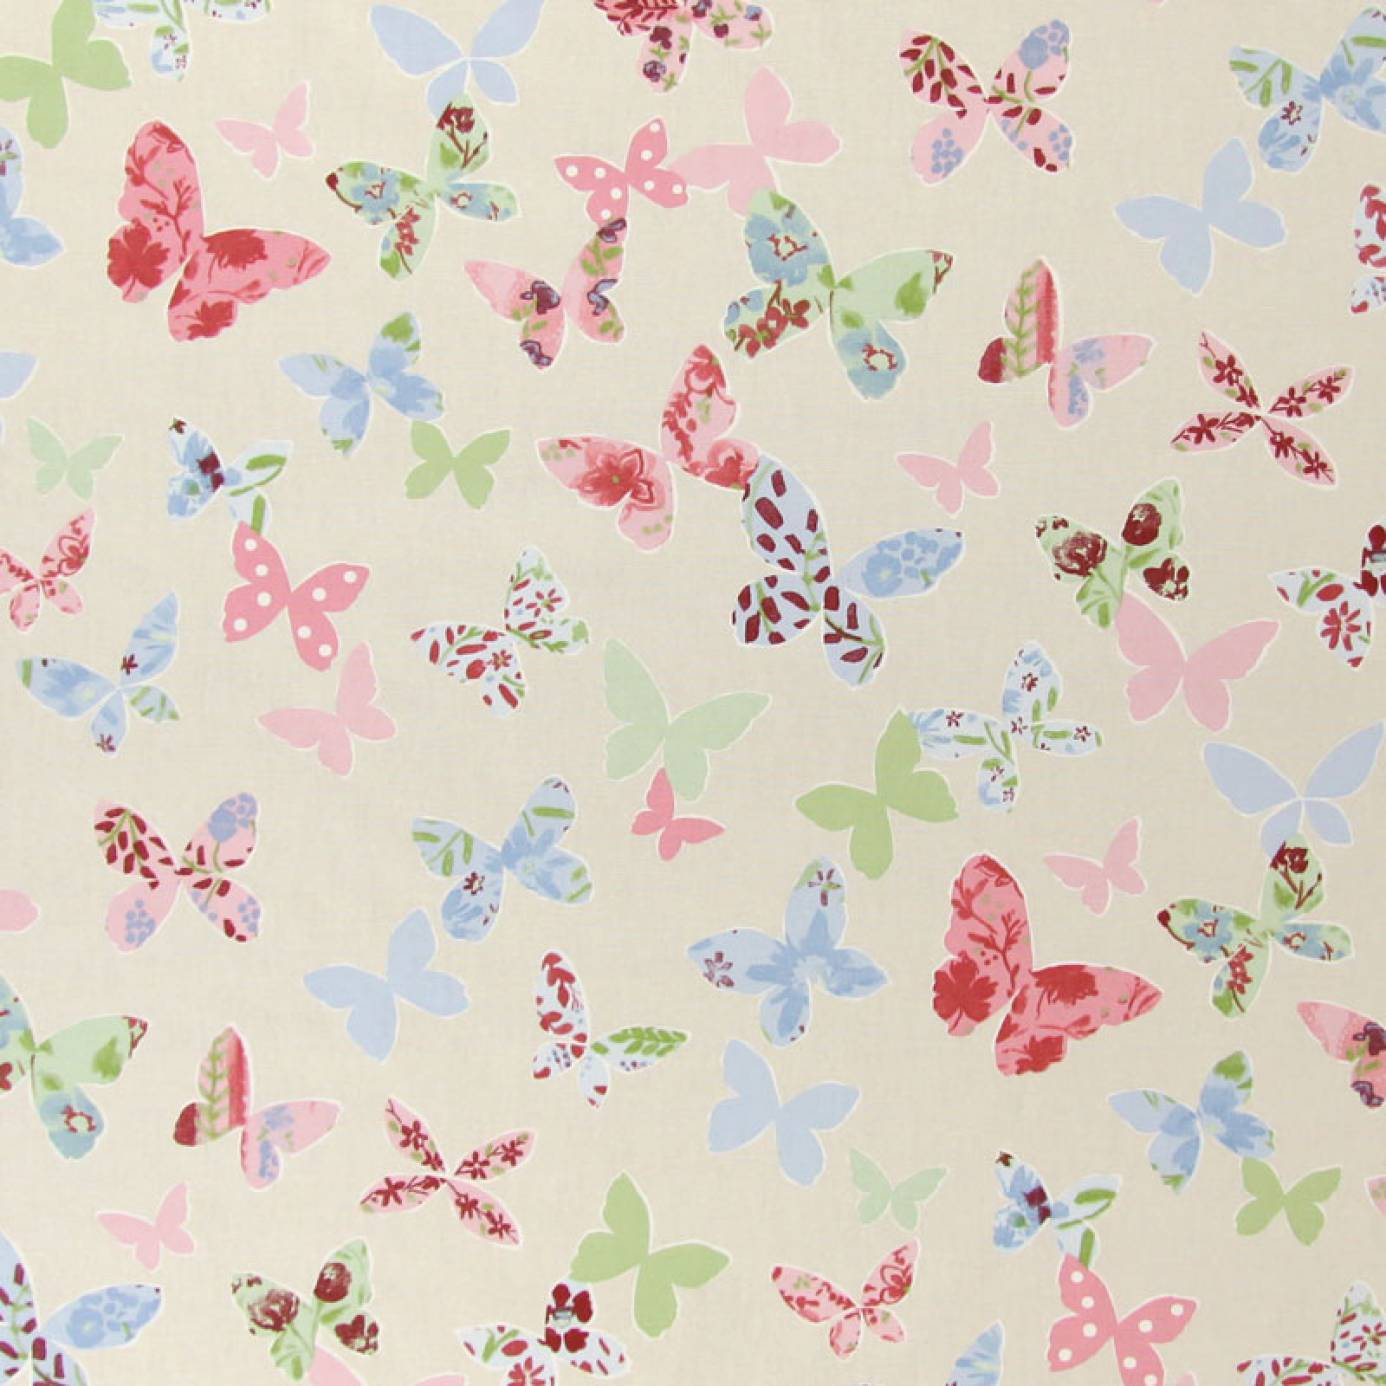 Butterfly Fabric Vintage 5860 284 Prestigious